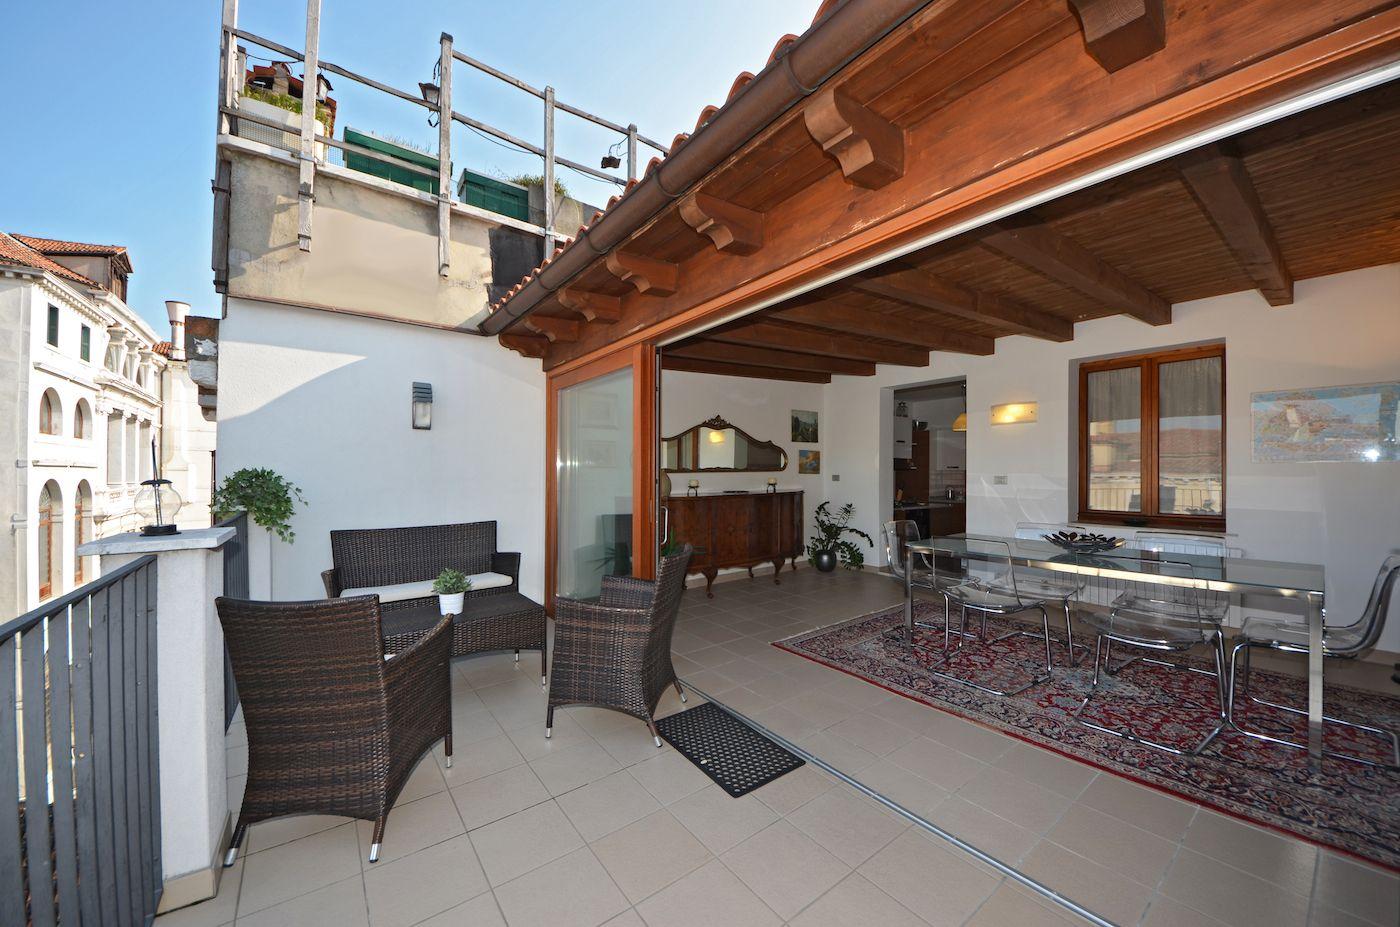 the veranda opens on the large terrace